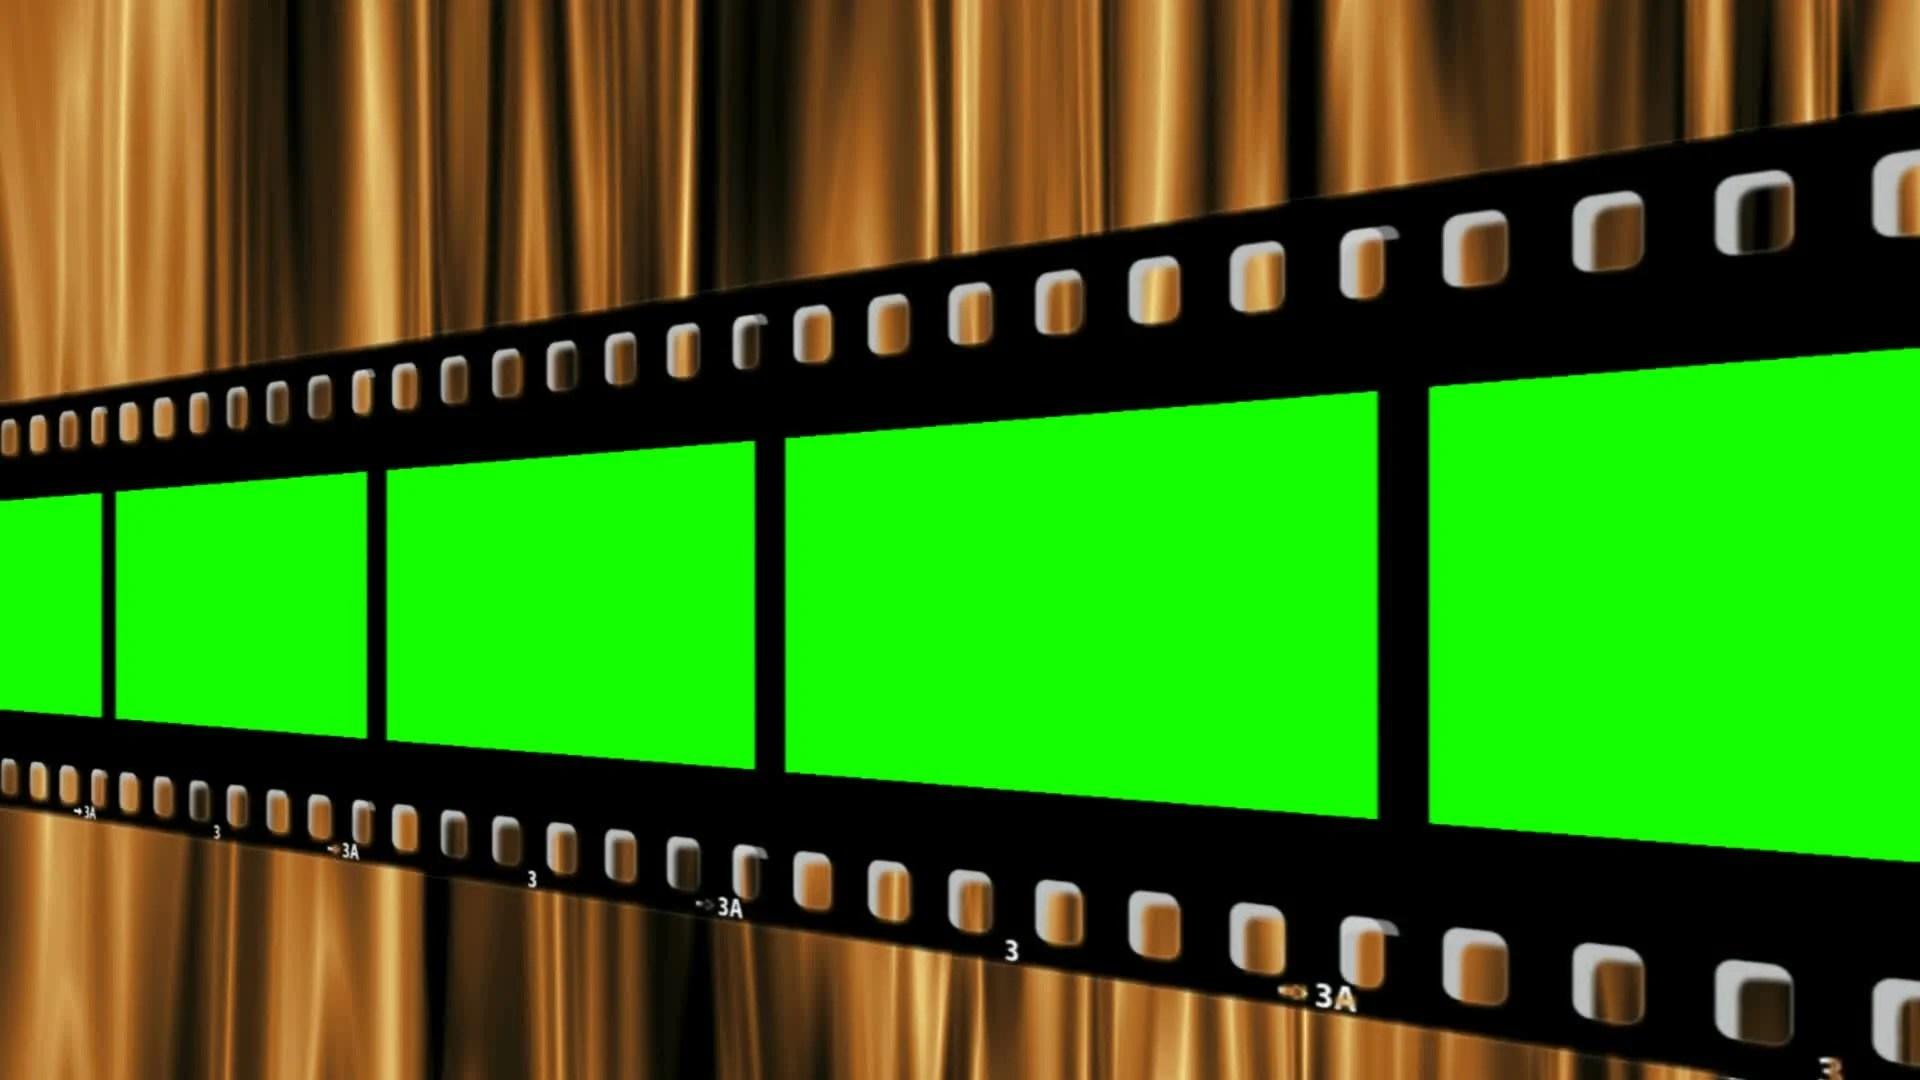 green screen filmstrip on golden curtains